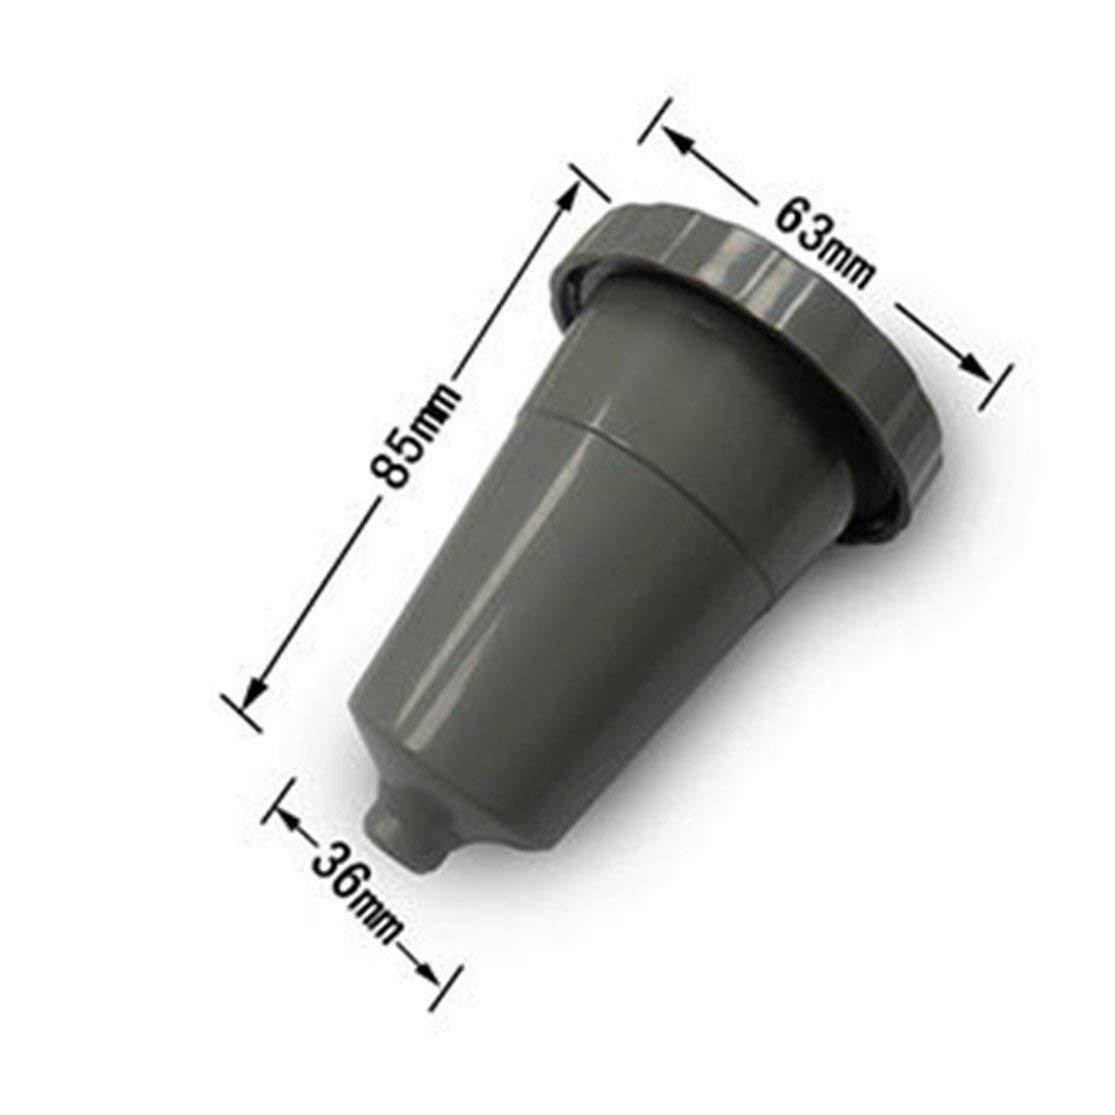 LouiseEvel215 3 UNIDS Reutilizable Vainas de Caf/é Filtro de Malla de Acero Inoxidable Reutilizable K-Taza Filtro de Caf/é para Keurig Home Brewing System